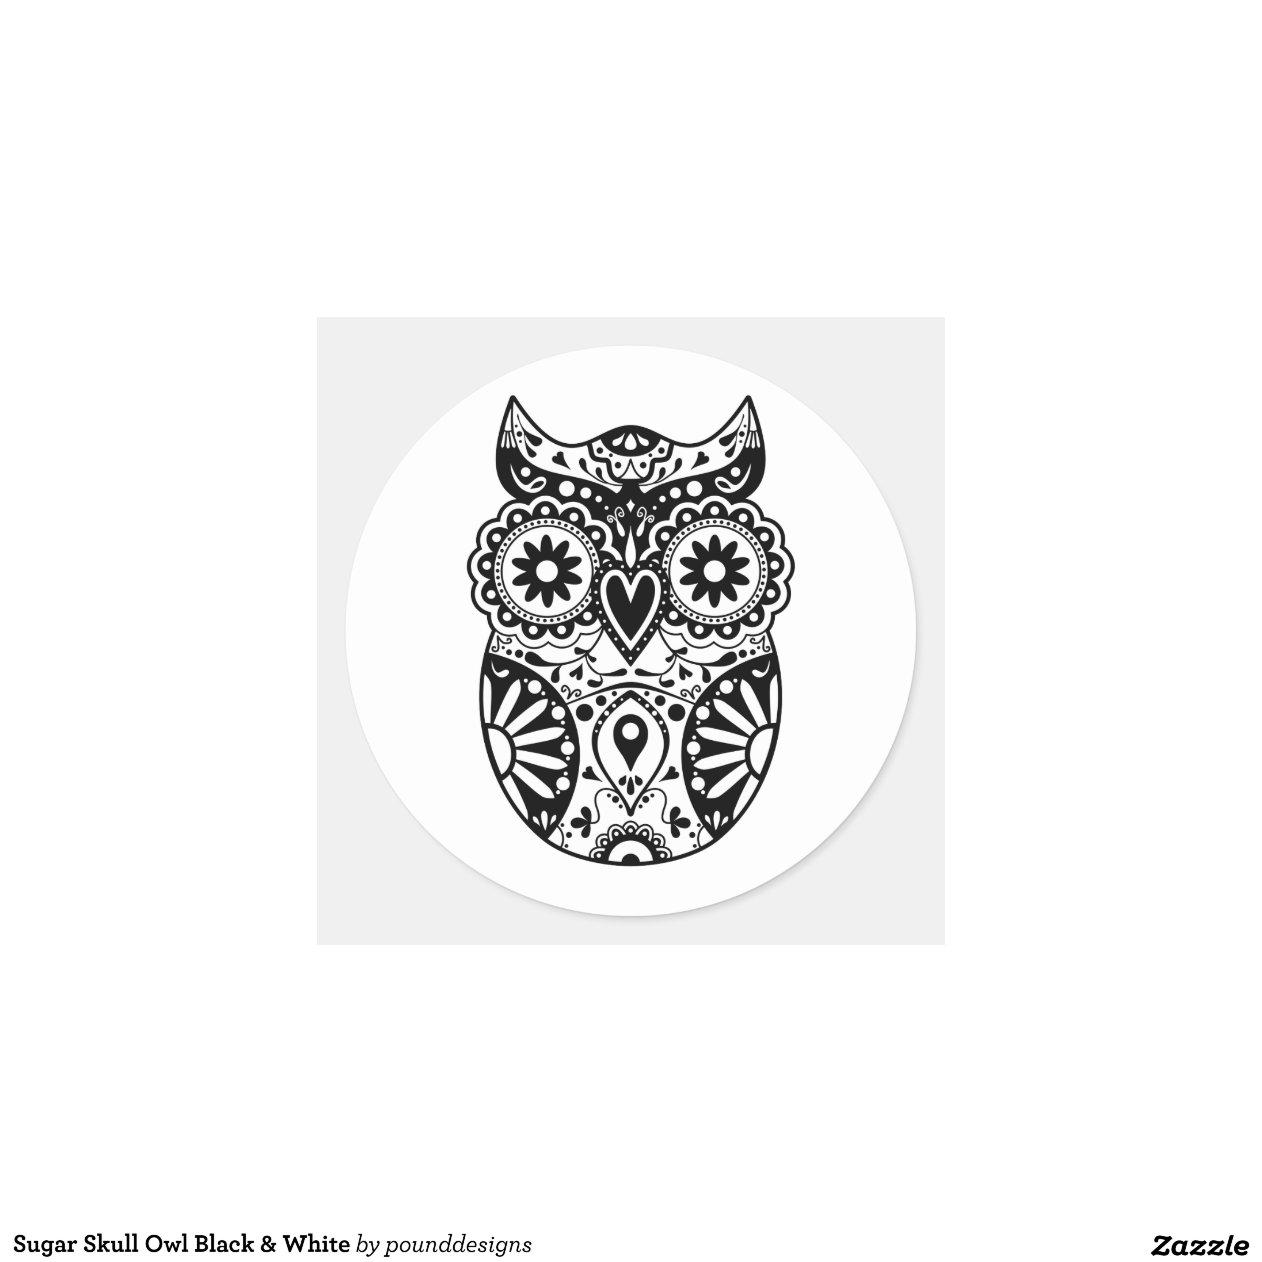 Sugar Skull Owl Black & White Round Stickers | Zazzle